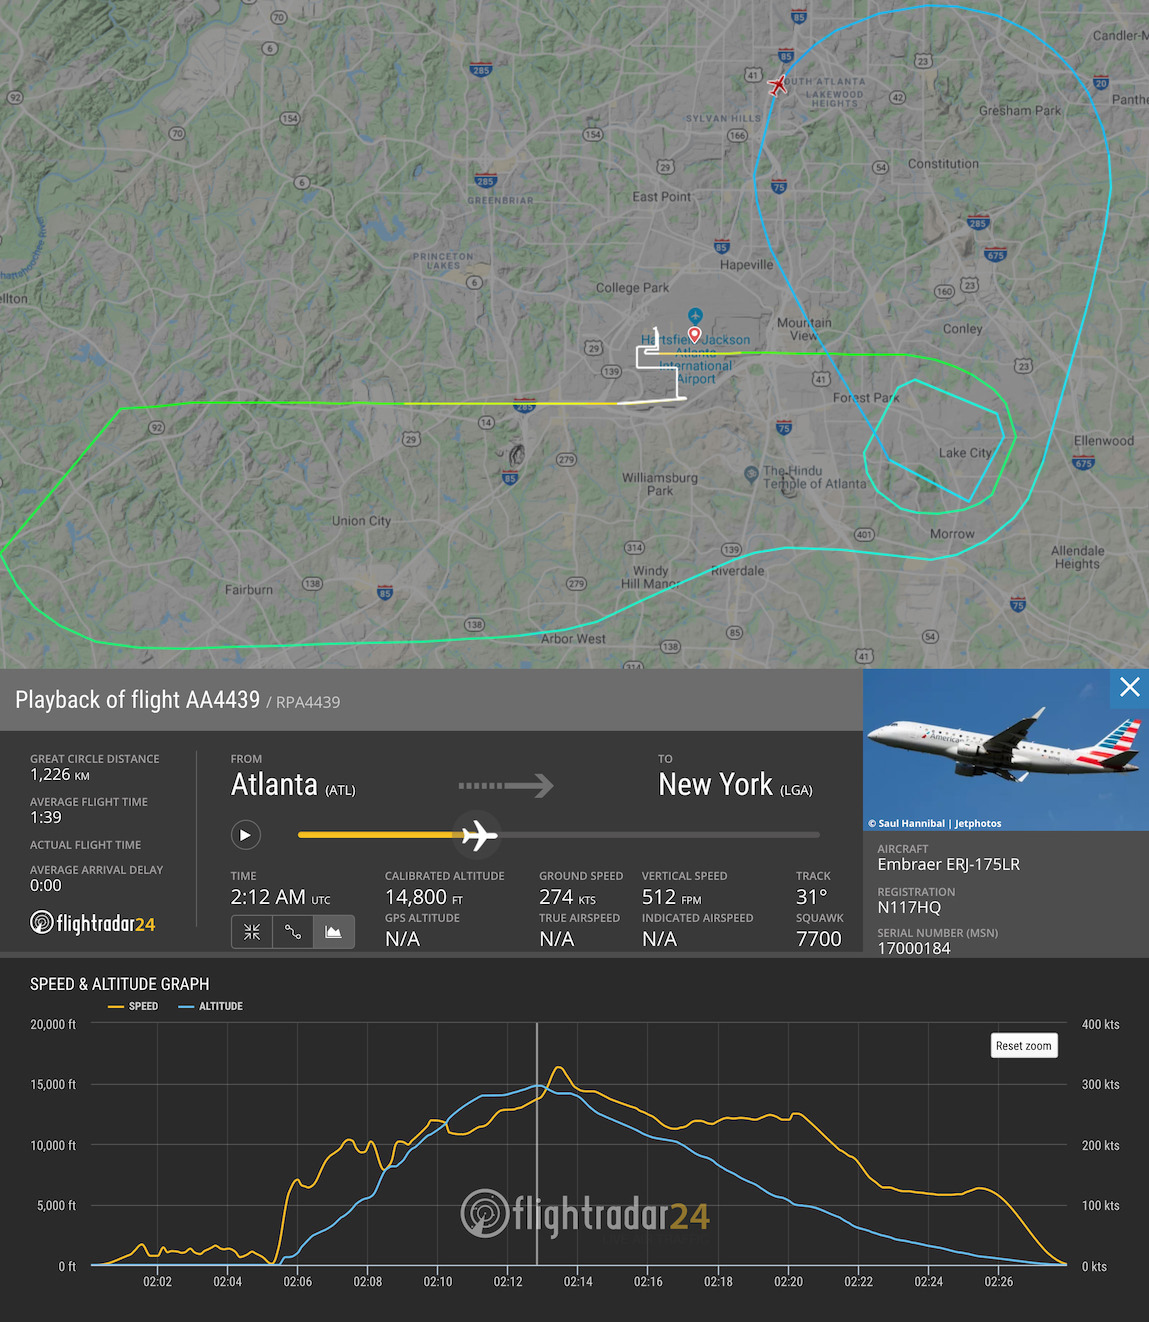 Republic E175 loss of control incident